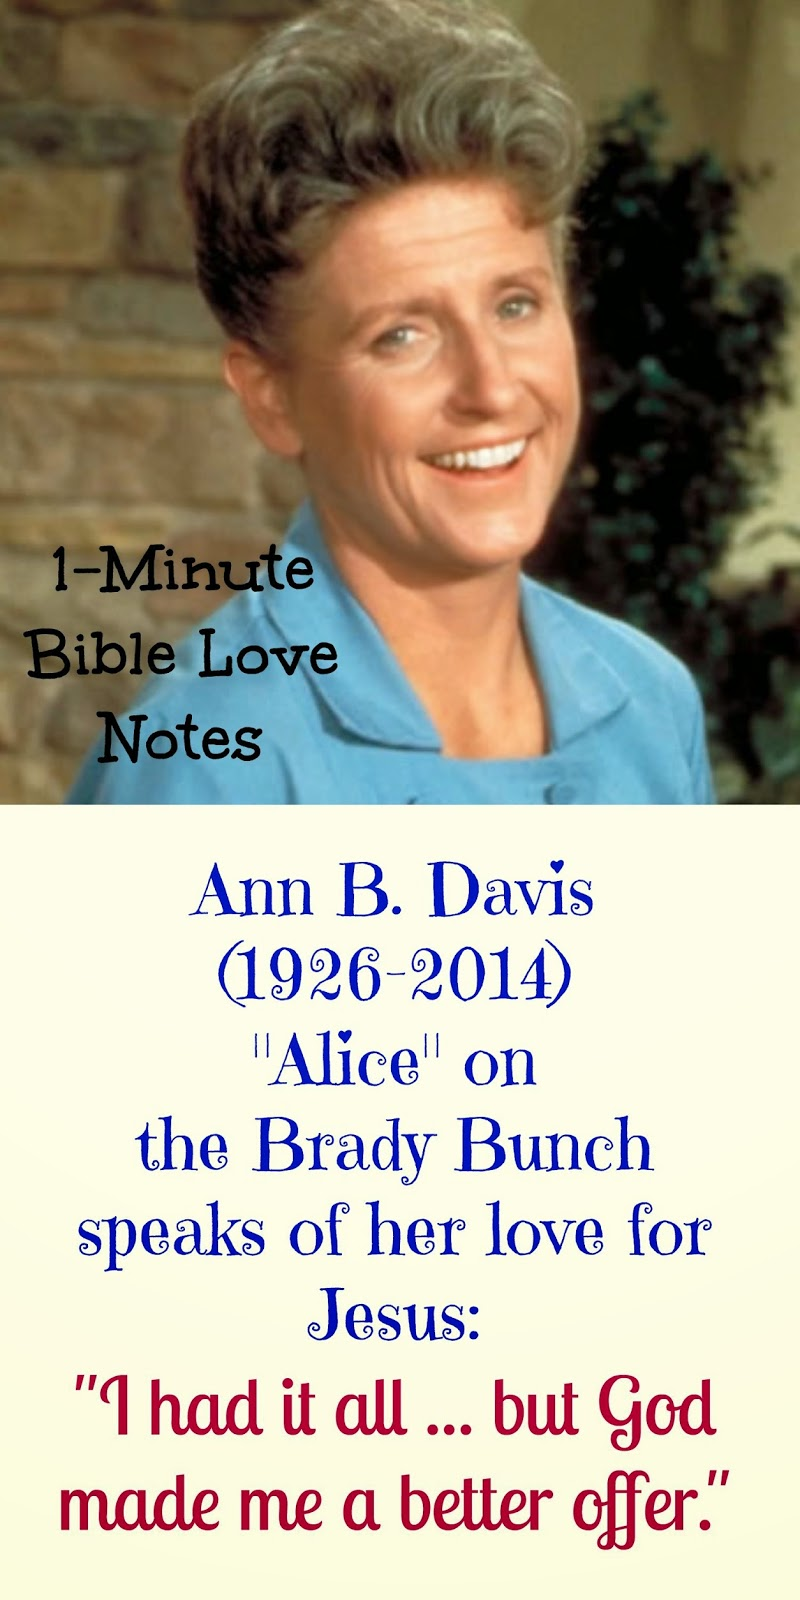 Ann B. Davis dies, Alice on Brady Bunch Dies, Ann B. Davis Strong Christian